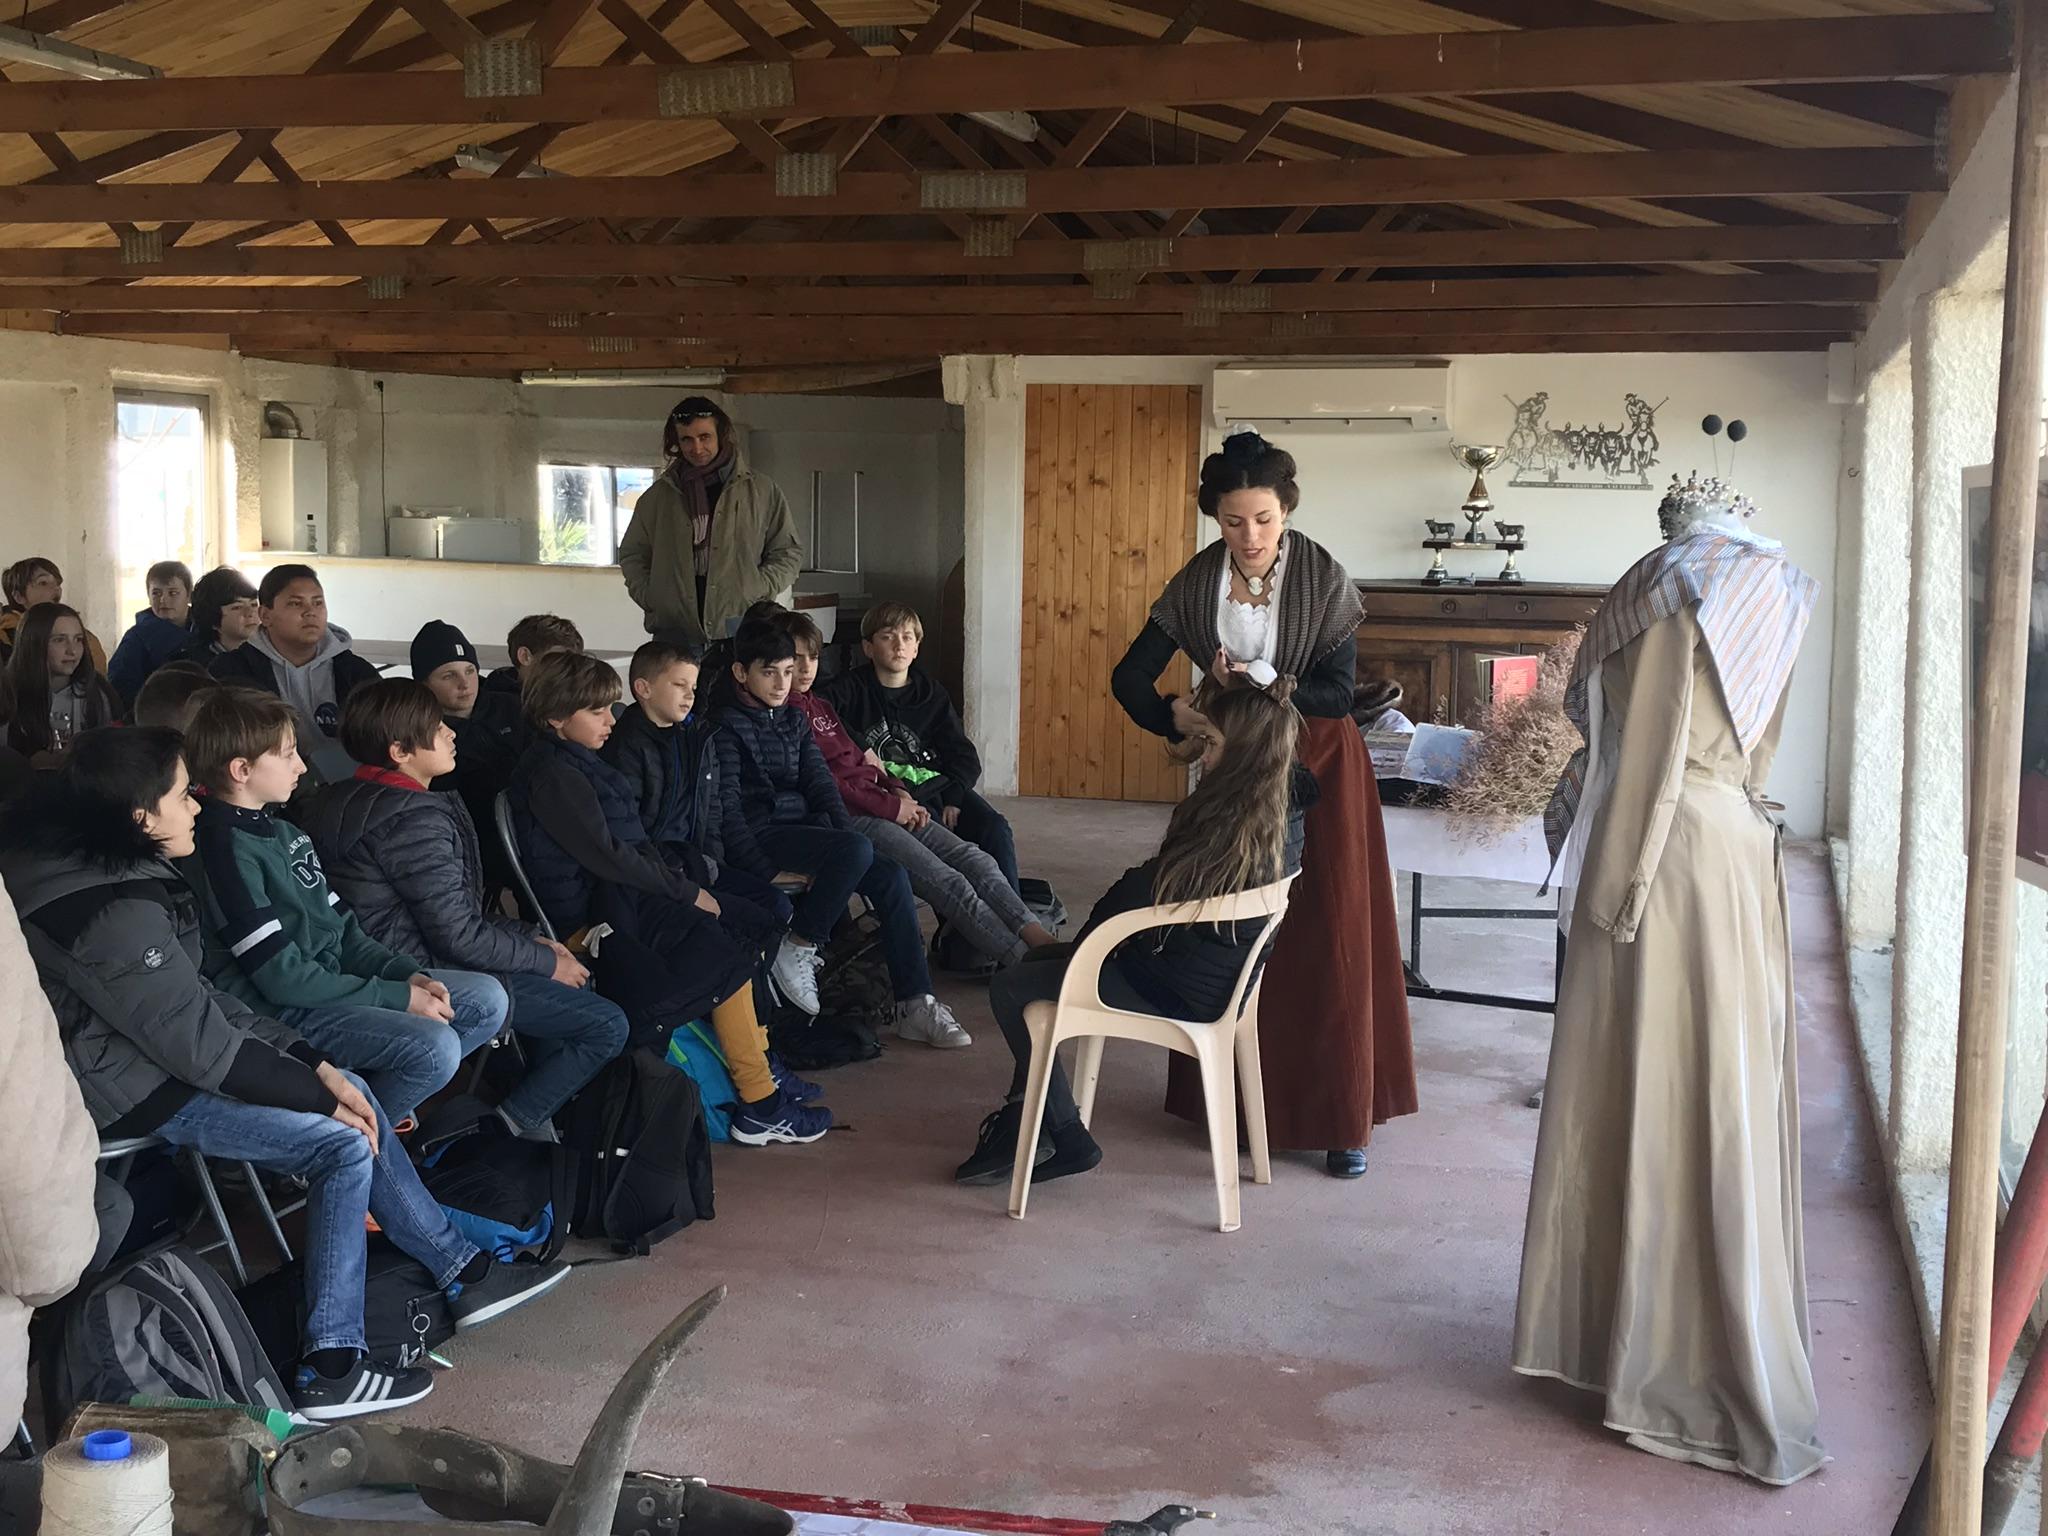 Prestations atelier costume traditionnel coiffe arlésienne transmettre tradition culture sortie pédagogique manade Chaballier